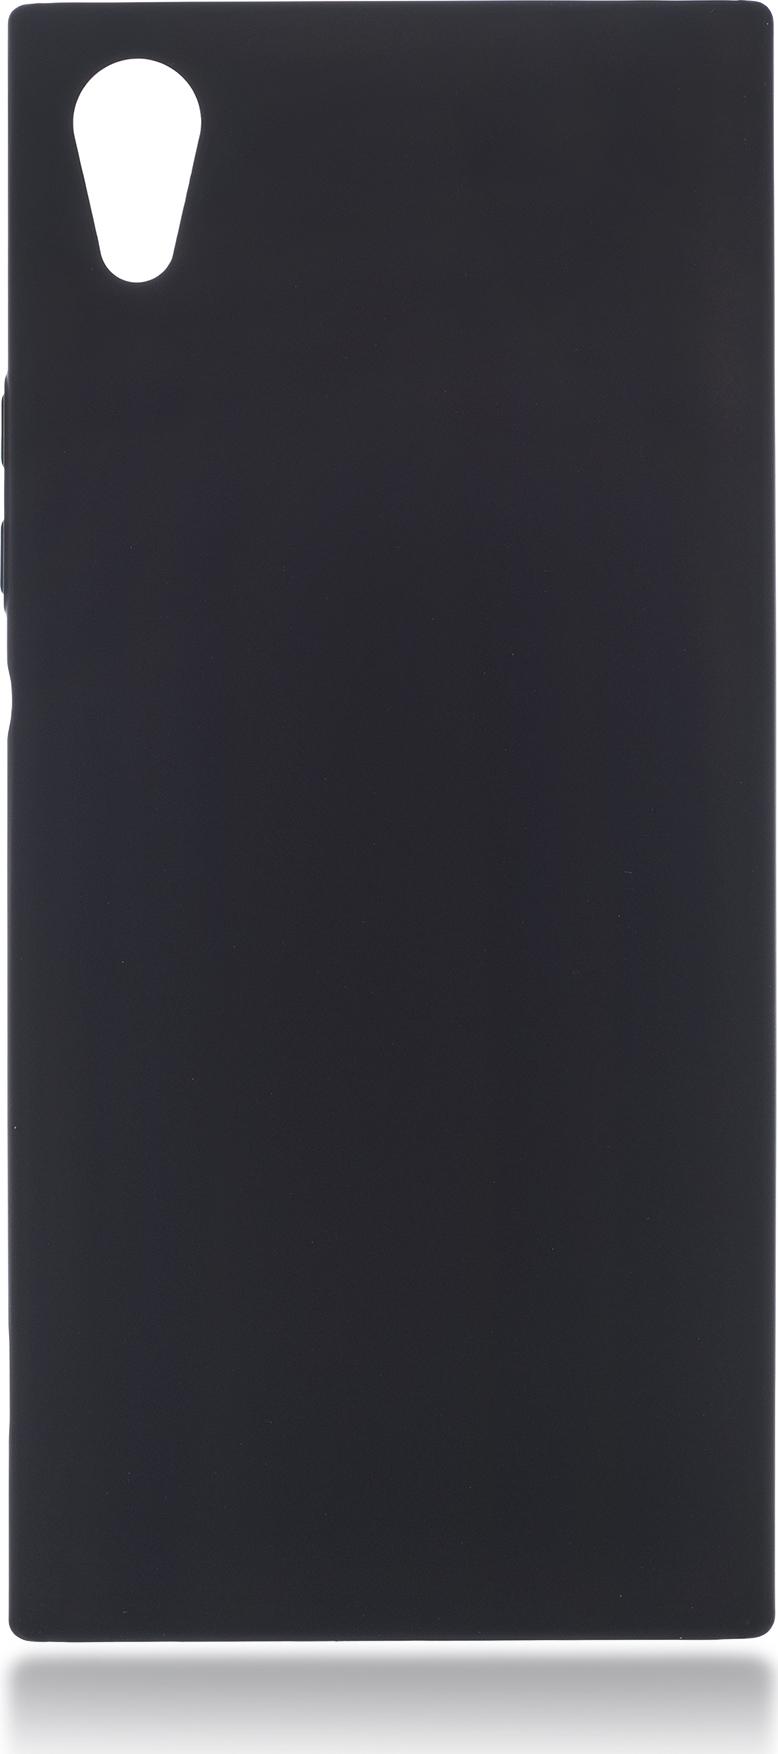 Чехол Brosco 4Side Soft-Touch для Sony Xperia XA1, черный цена